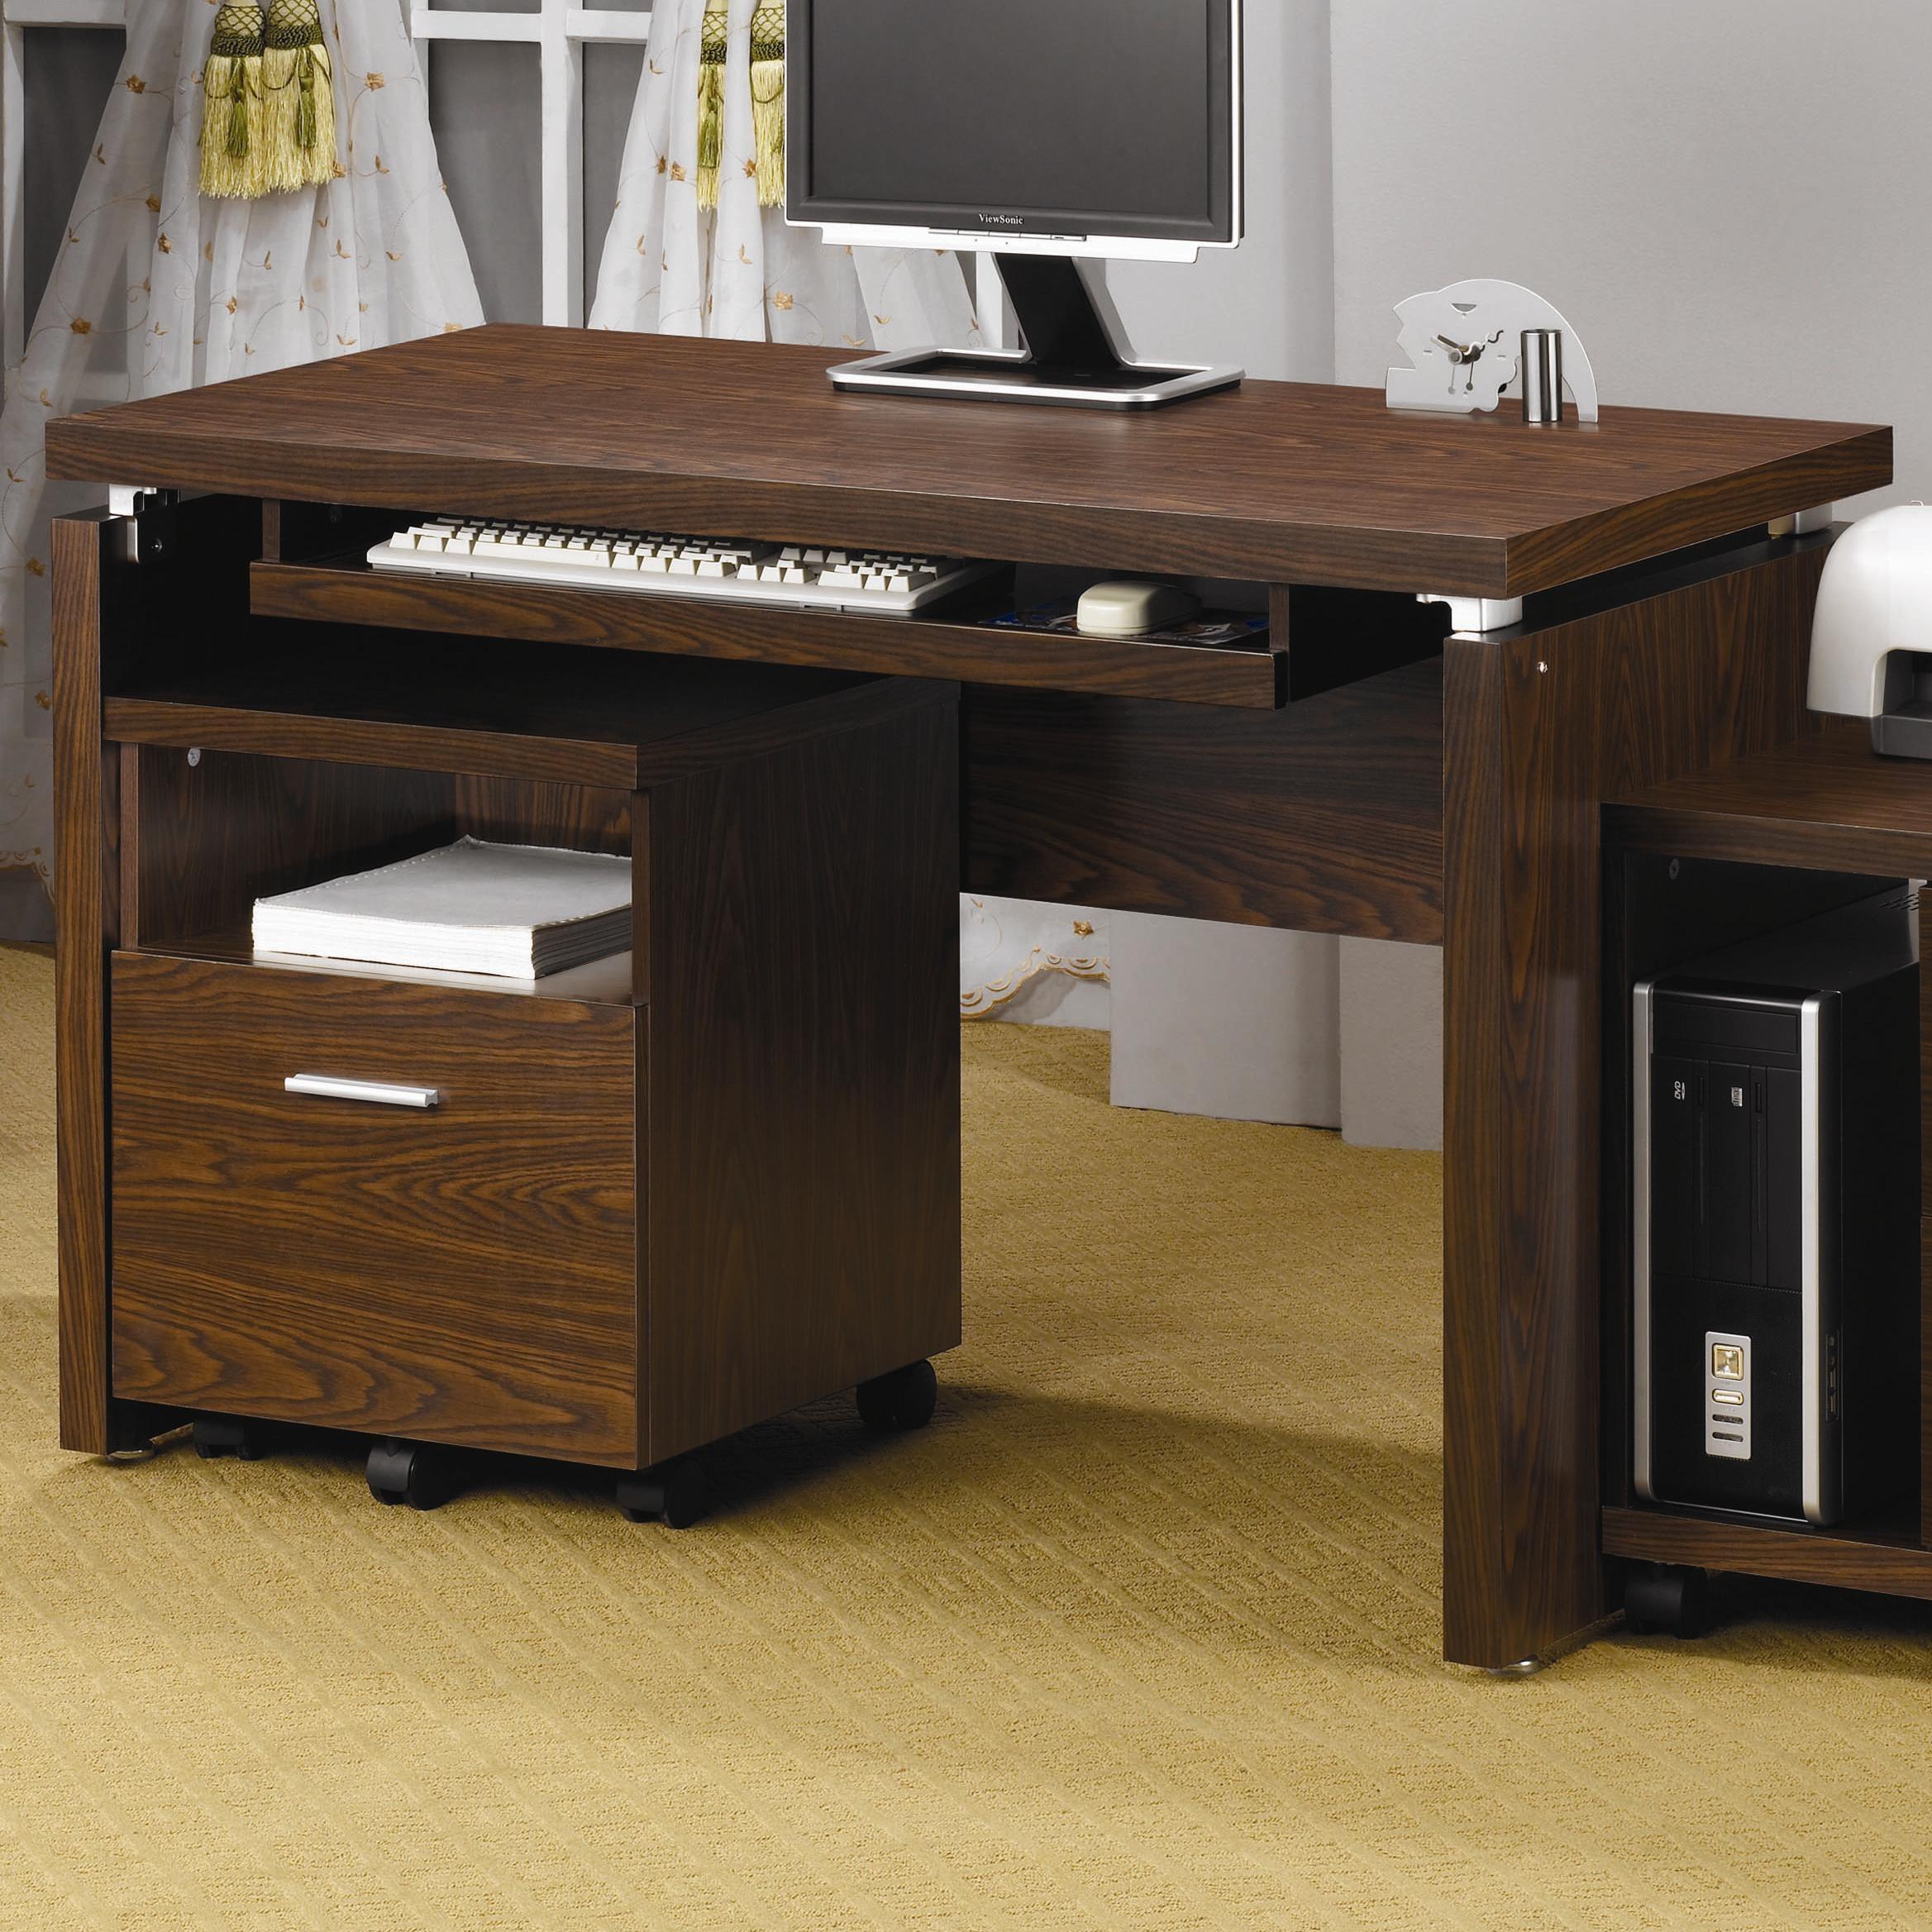 Coaster Home Office Computer Desk 800831